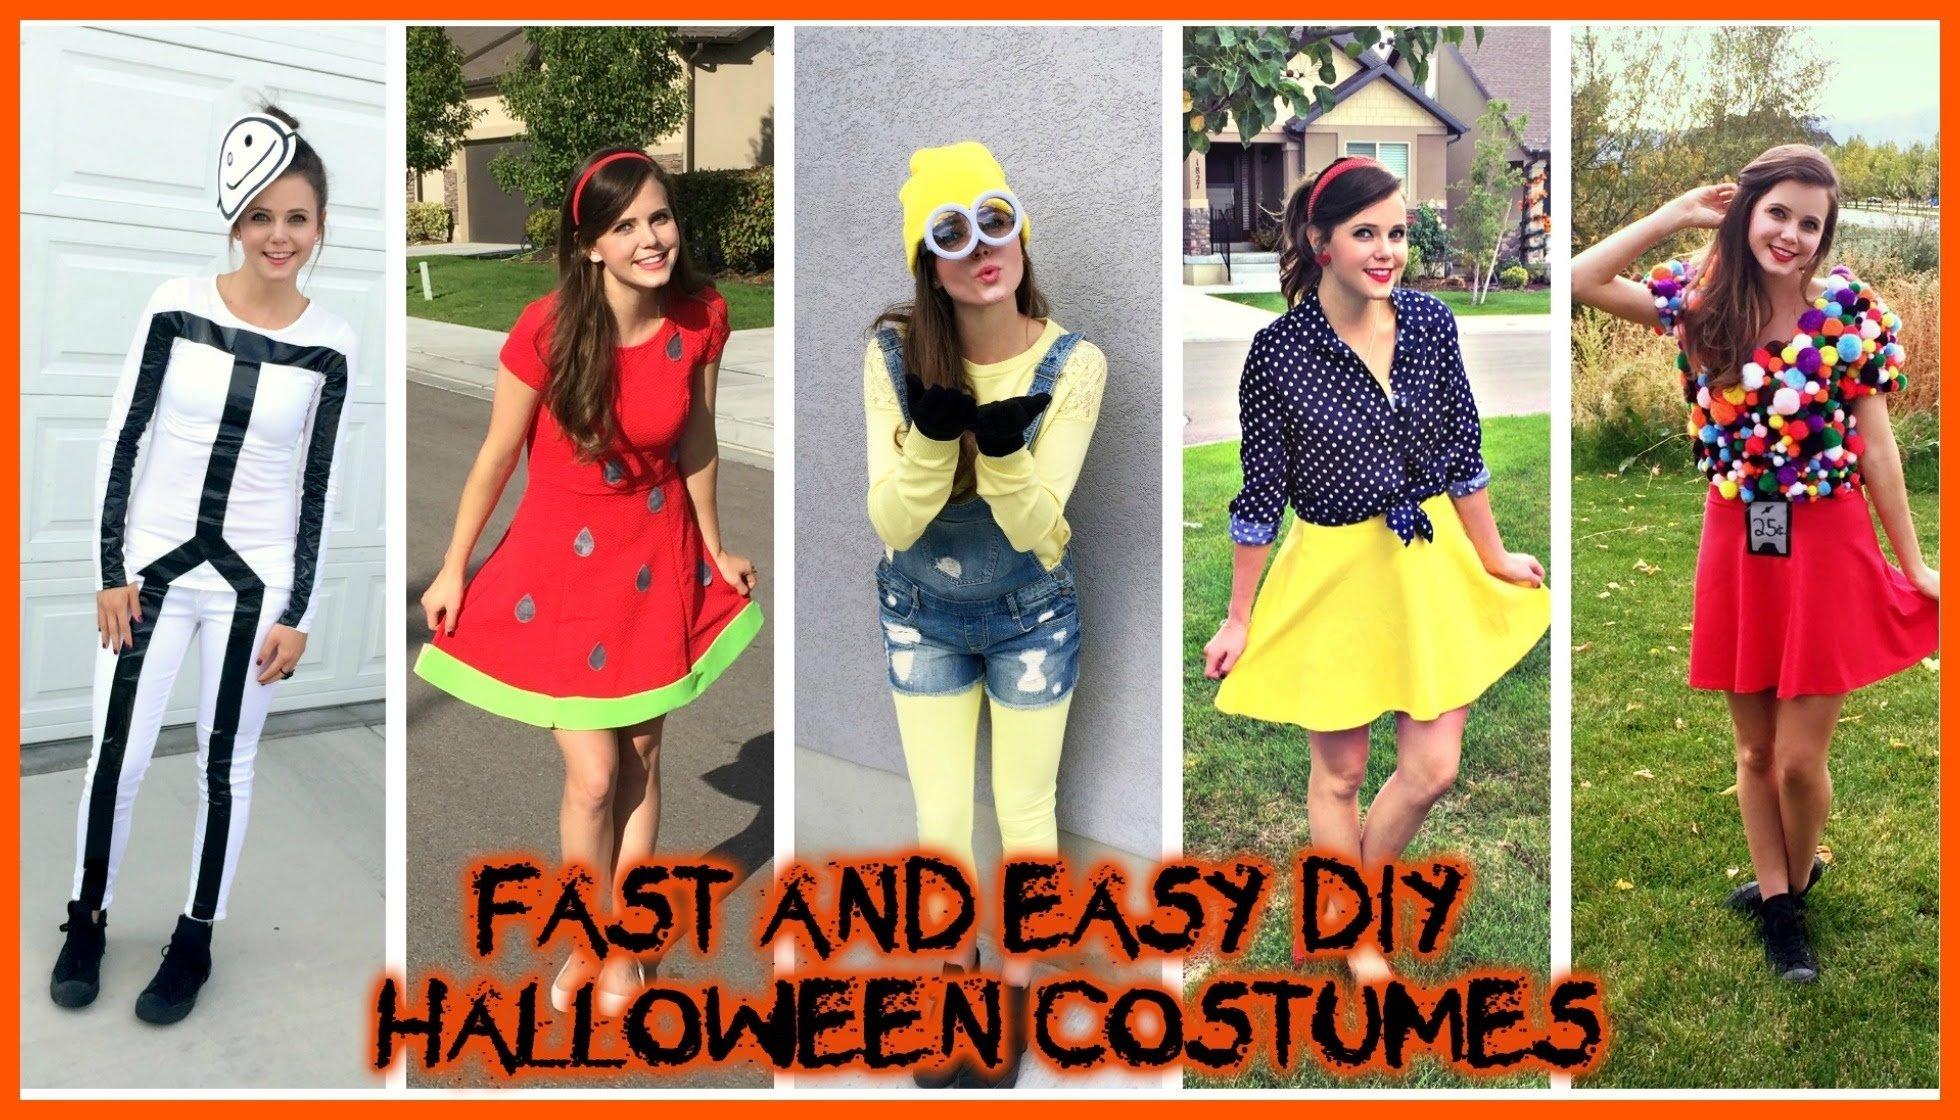 10 Attractive Last Minute Easy Costume Ideas diy halloween costumes super easy cheap last minute ideas tiffany 2 2020